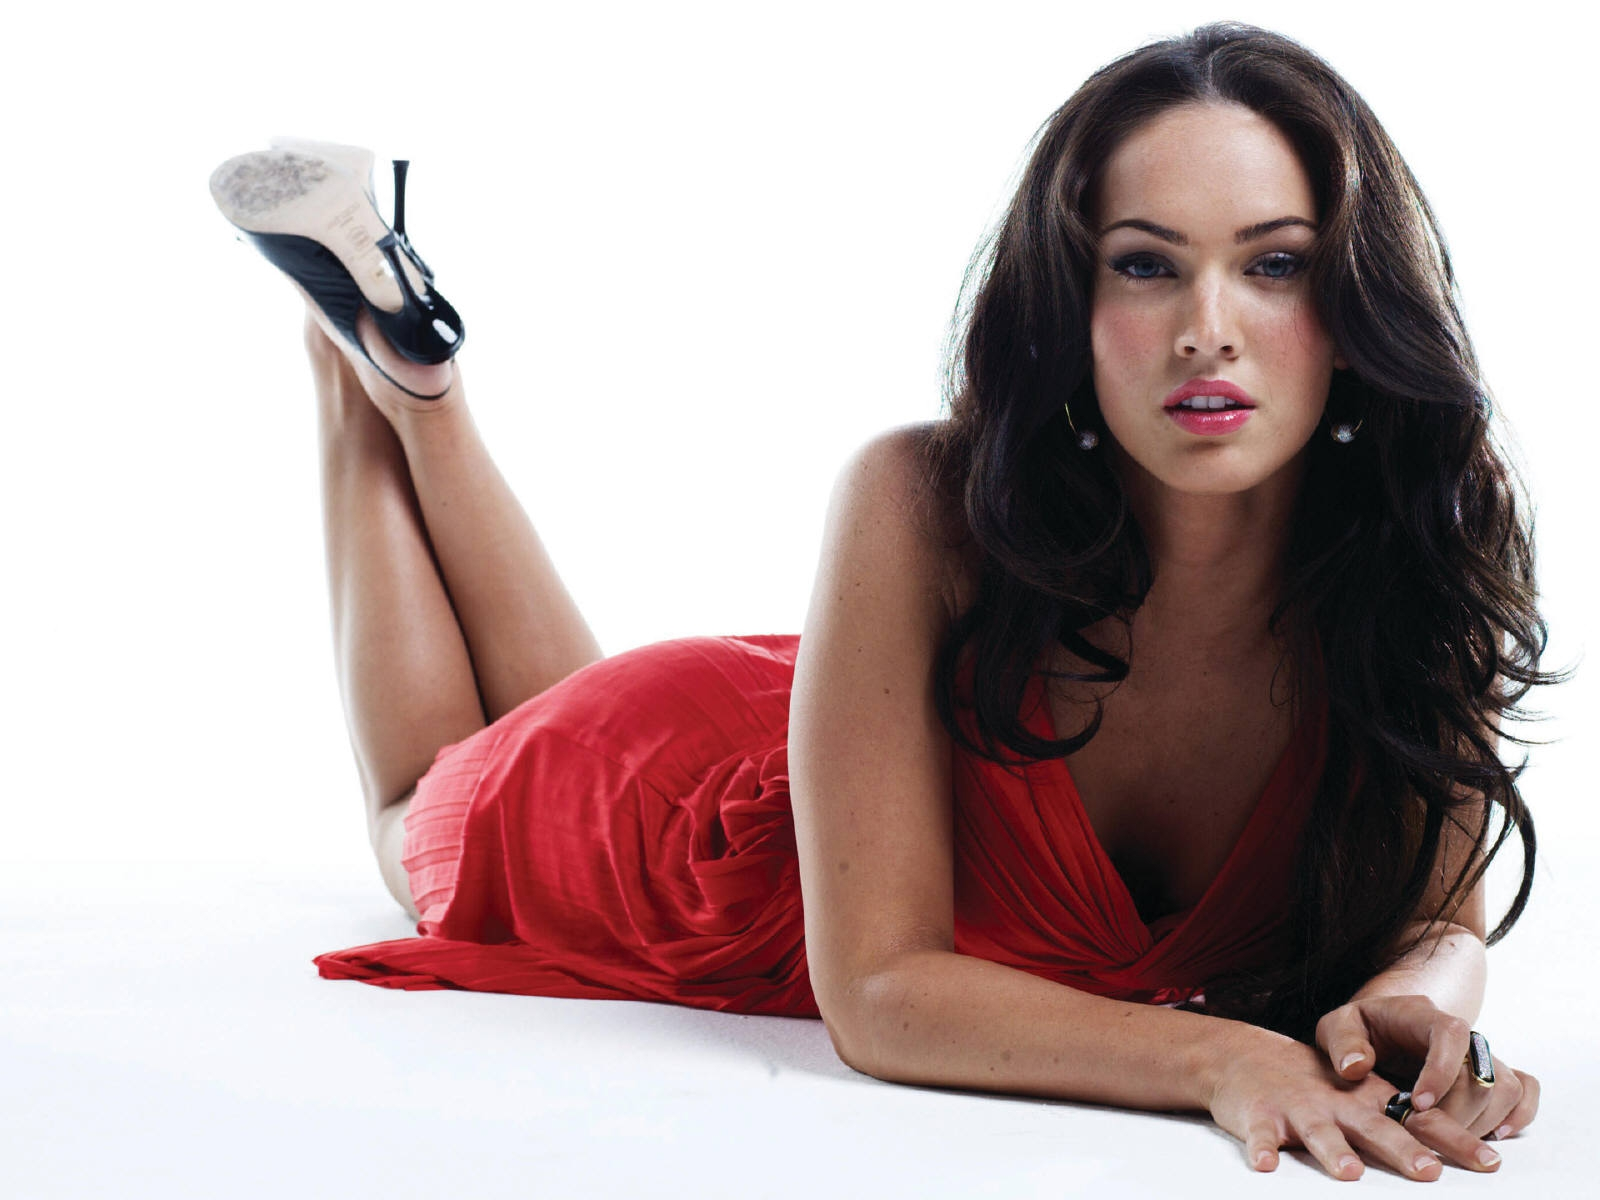 Меган фокс секси видео